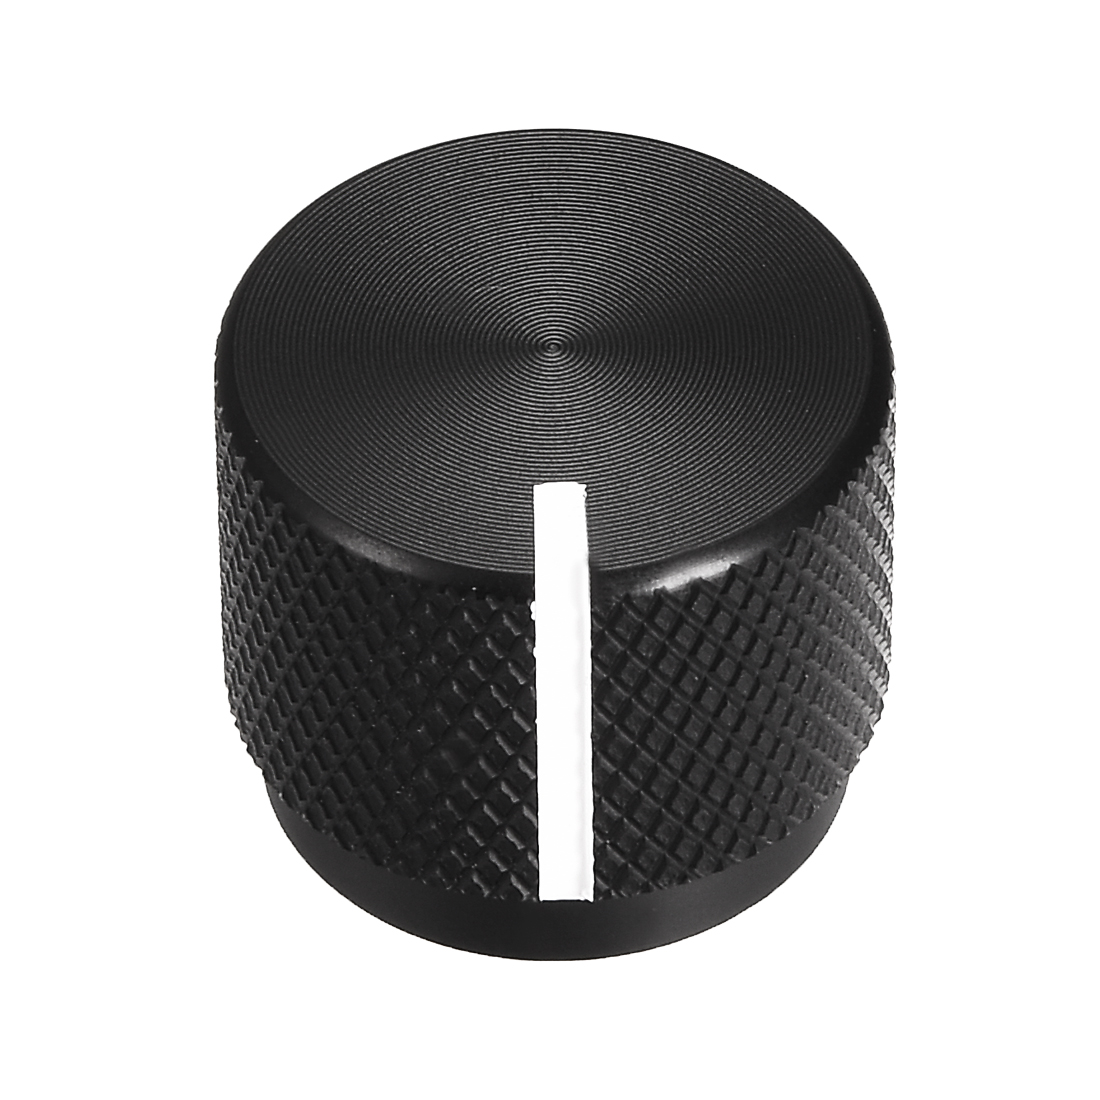 Stereo Knob, 20*6*17 mm Aluminium Alloy, Volume Control Knobs, Black